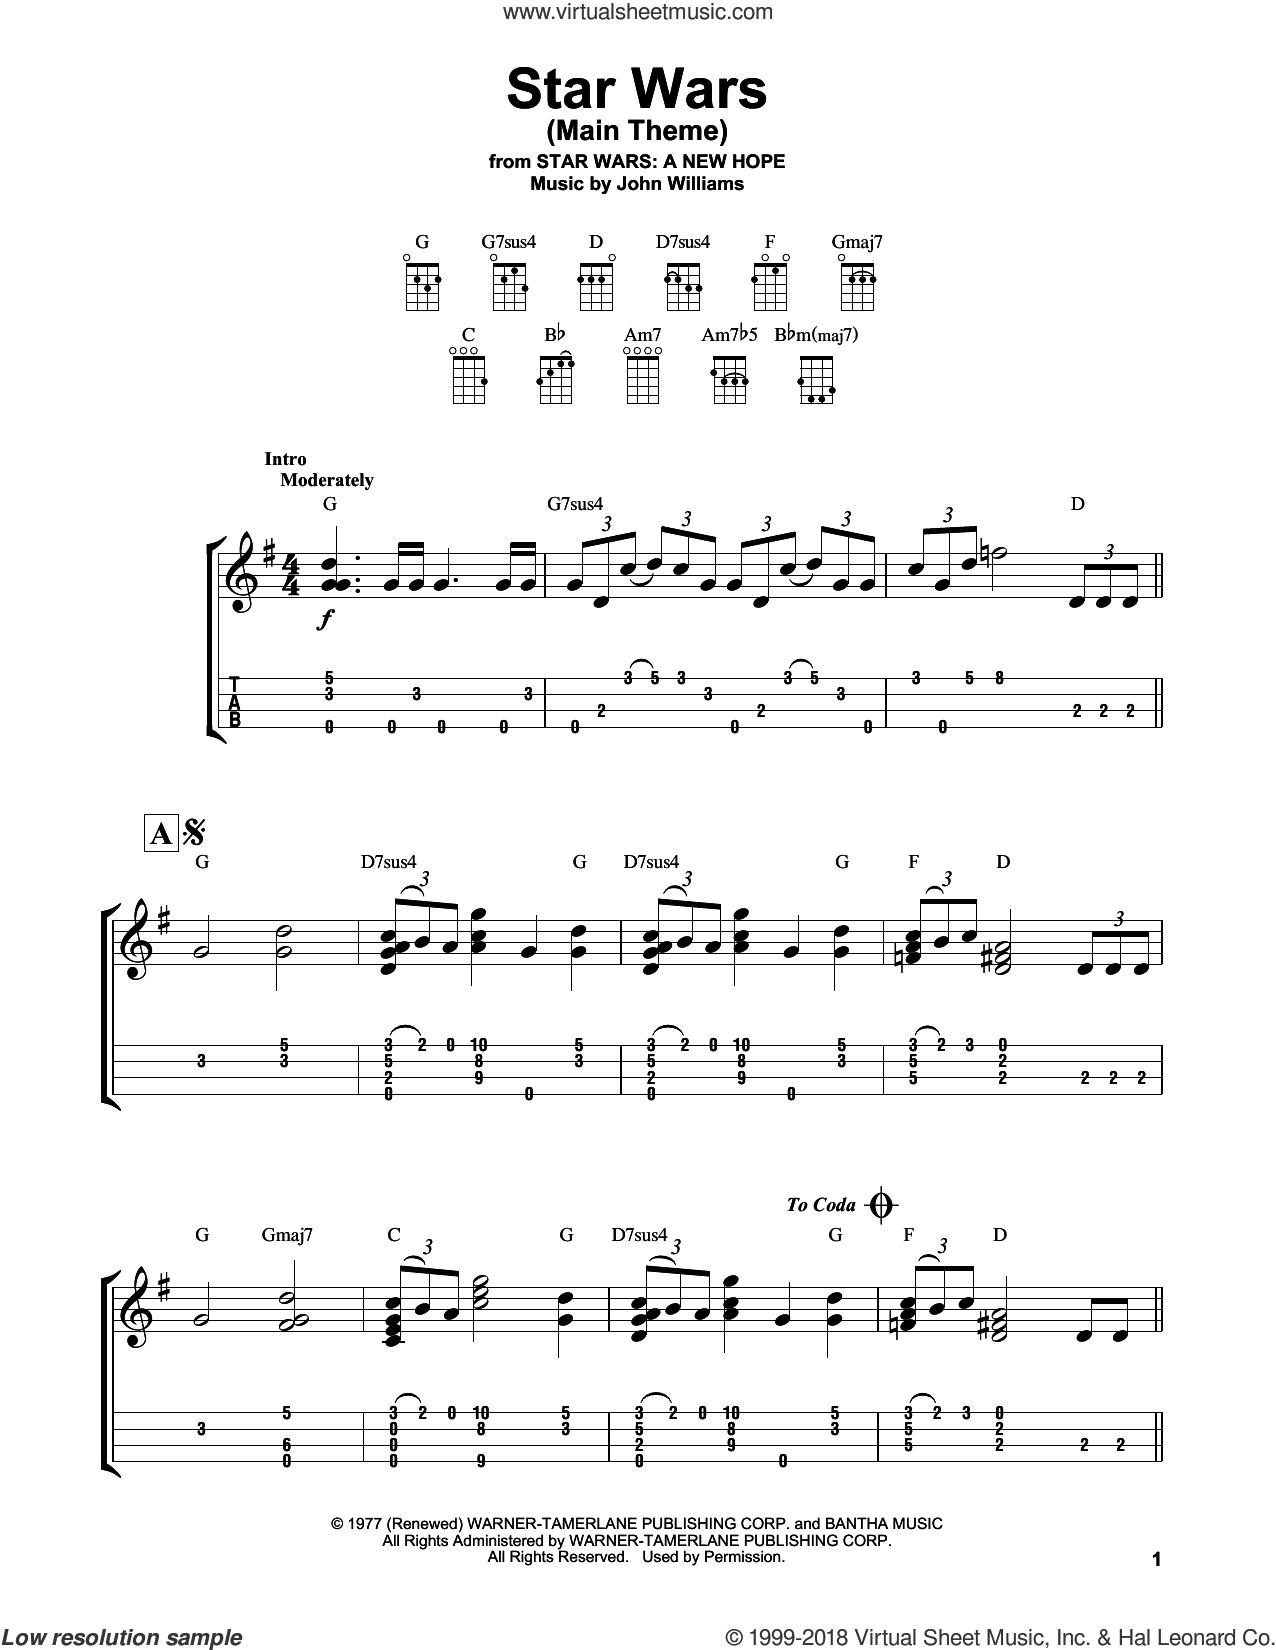 Star Wars (Main Theme) sheet music for ukulele (easy tablature) (ukulele easy tab) by John Williams, intermediate skill level